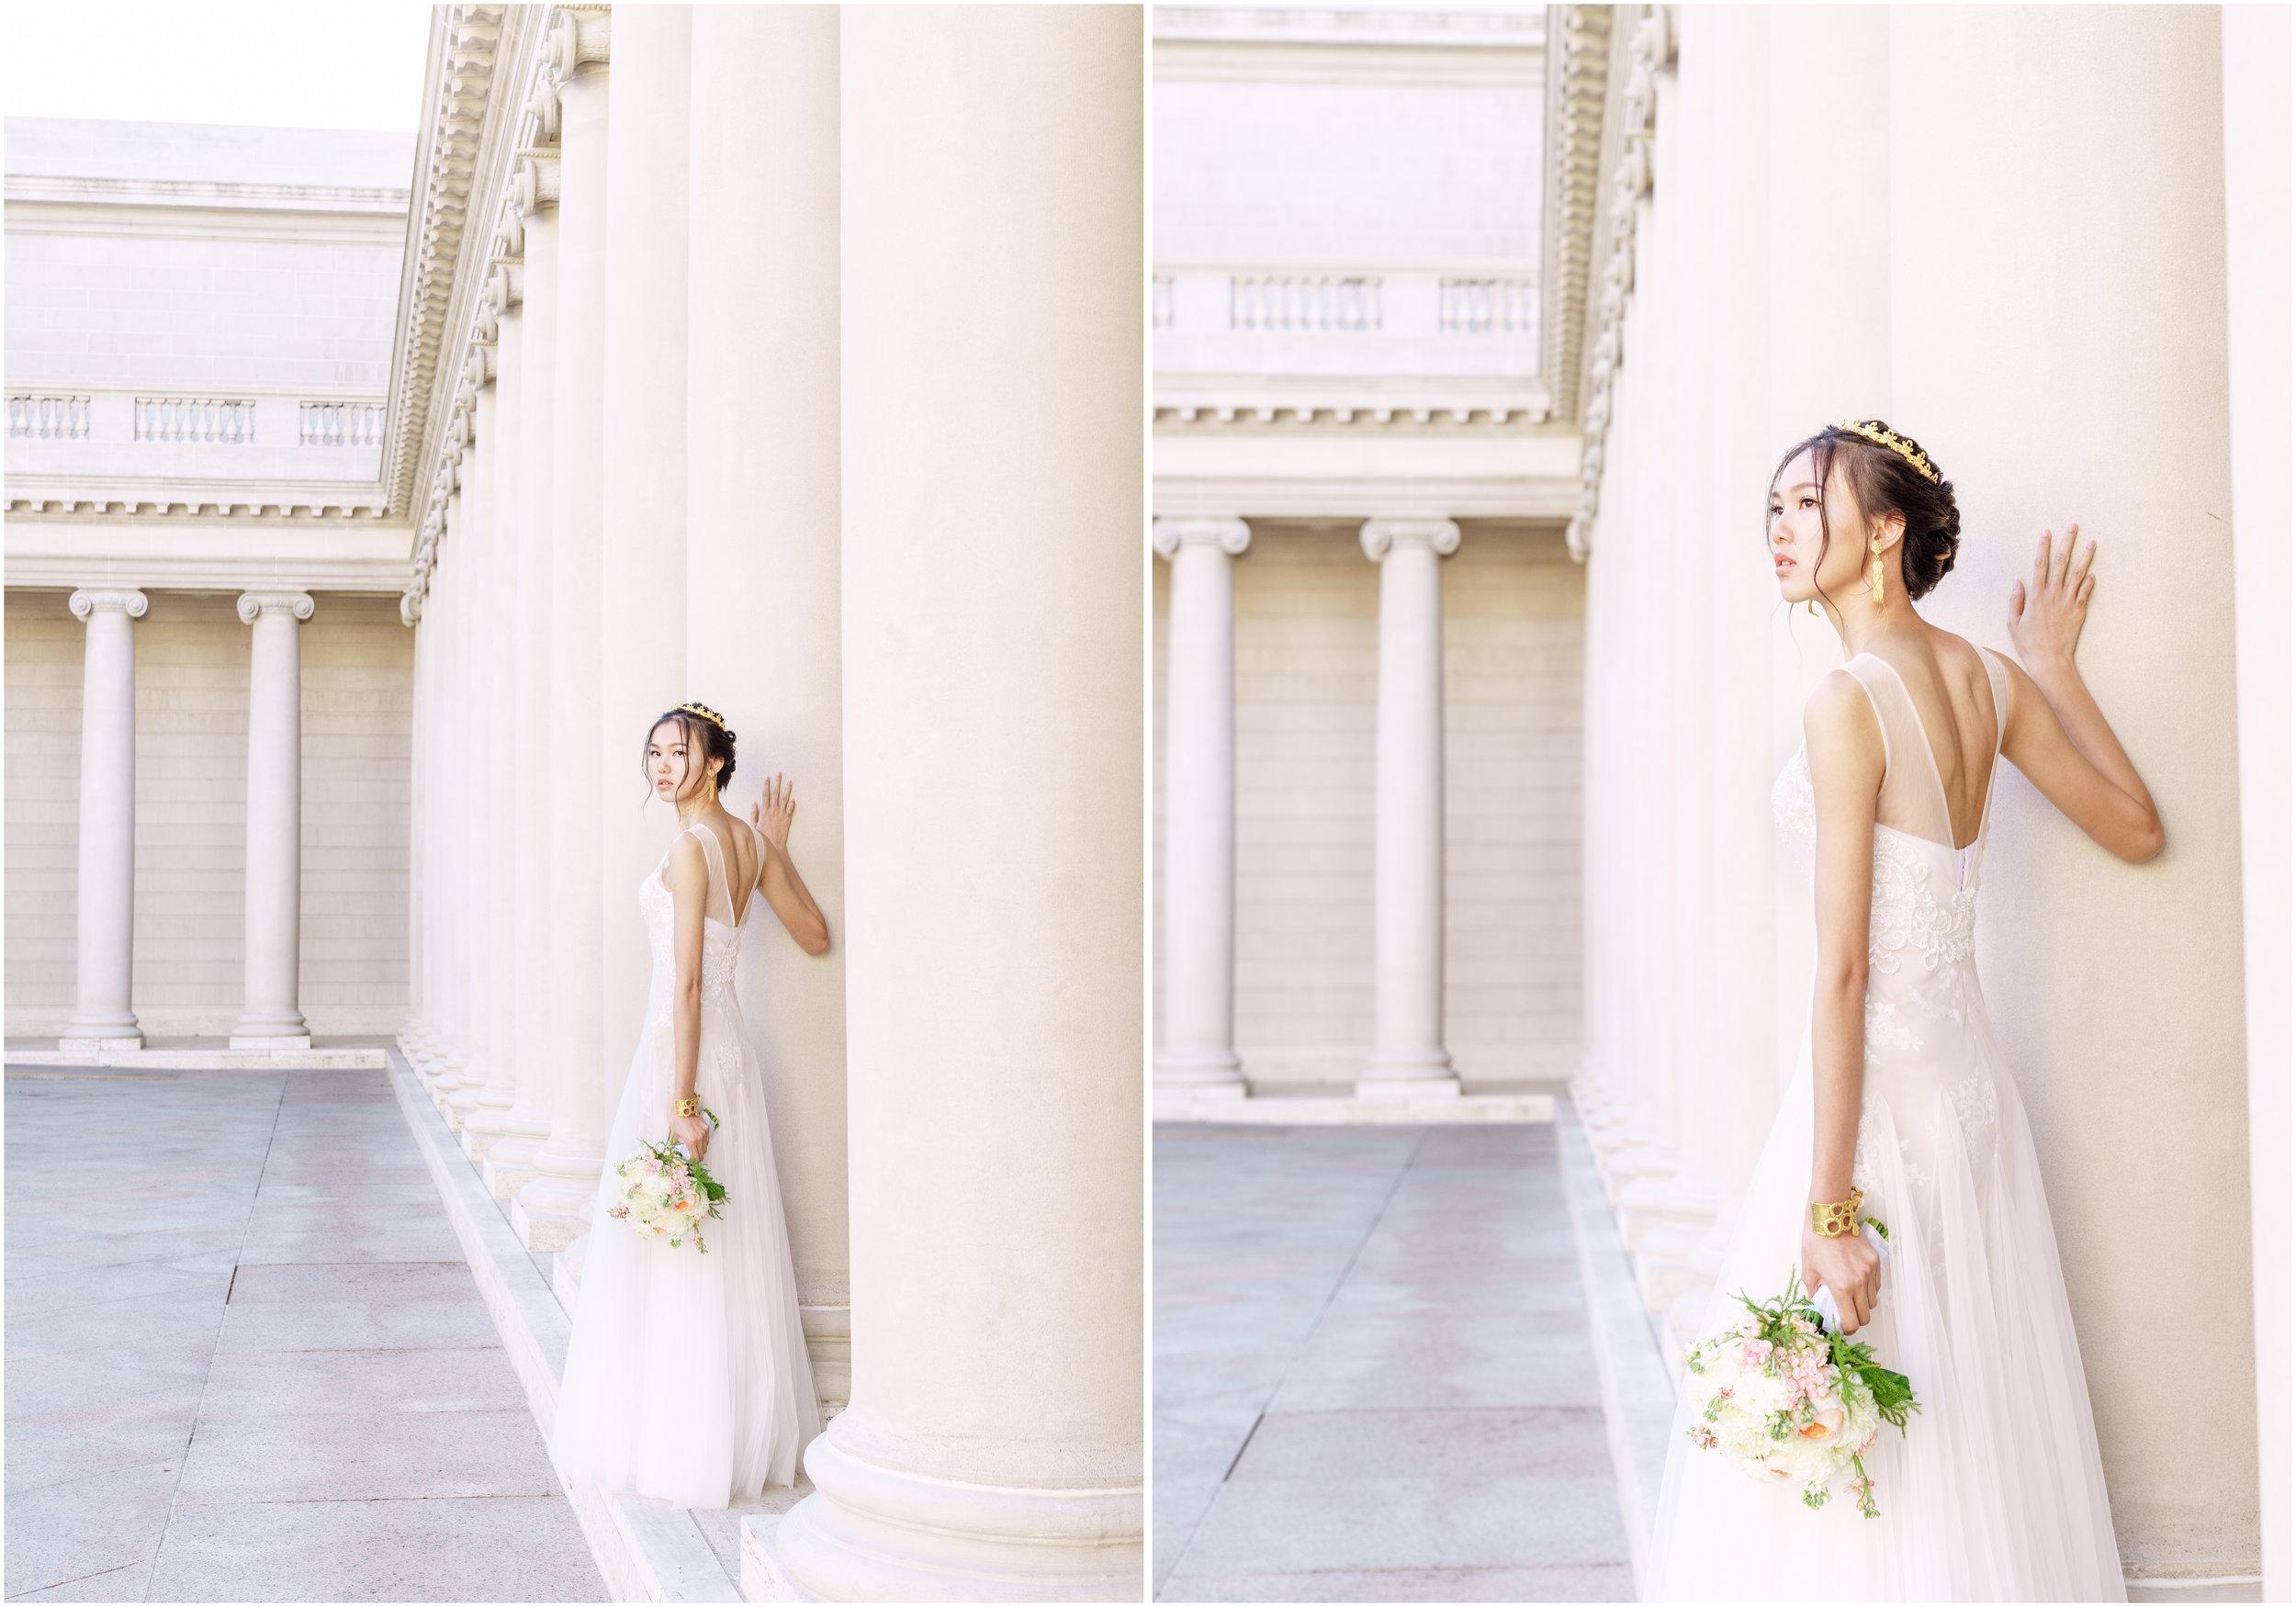 San Francisco Wedding Photographer - Pinnel Photography I&V C-2.jpg